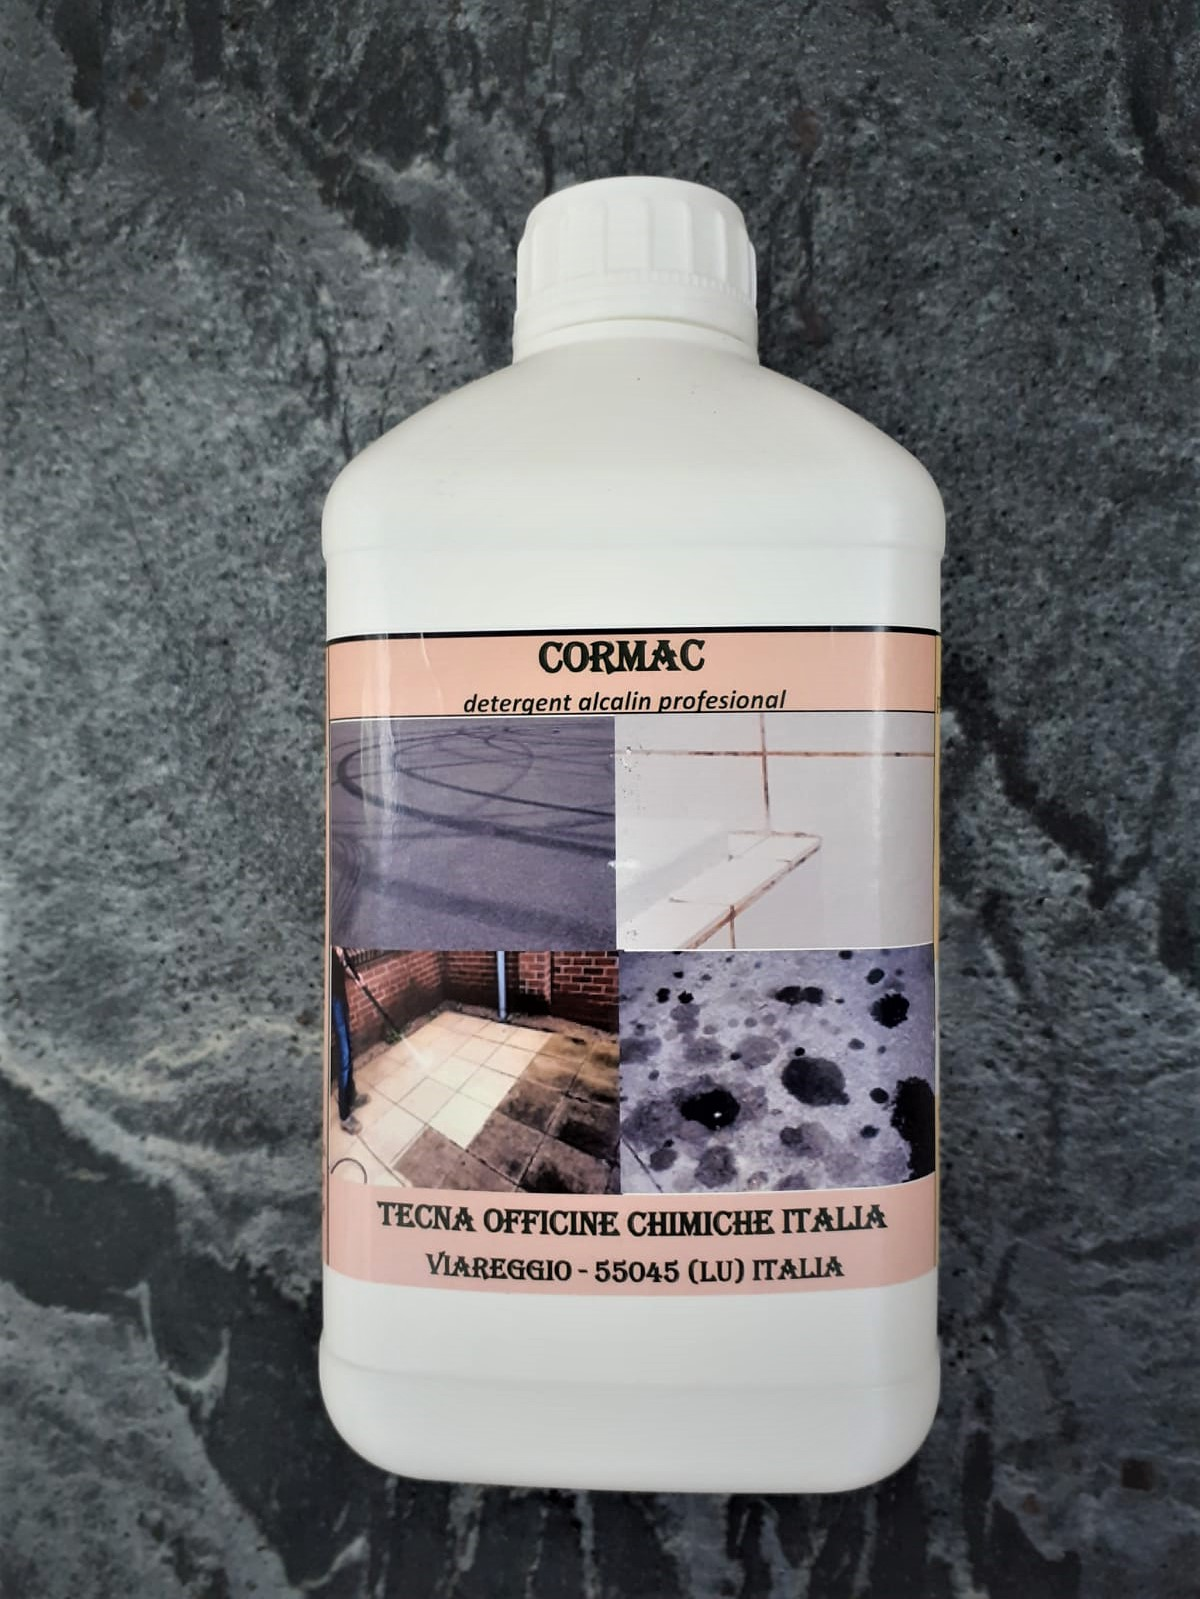 detergent-alcalin-profesional-cormac-1